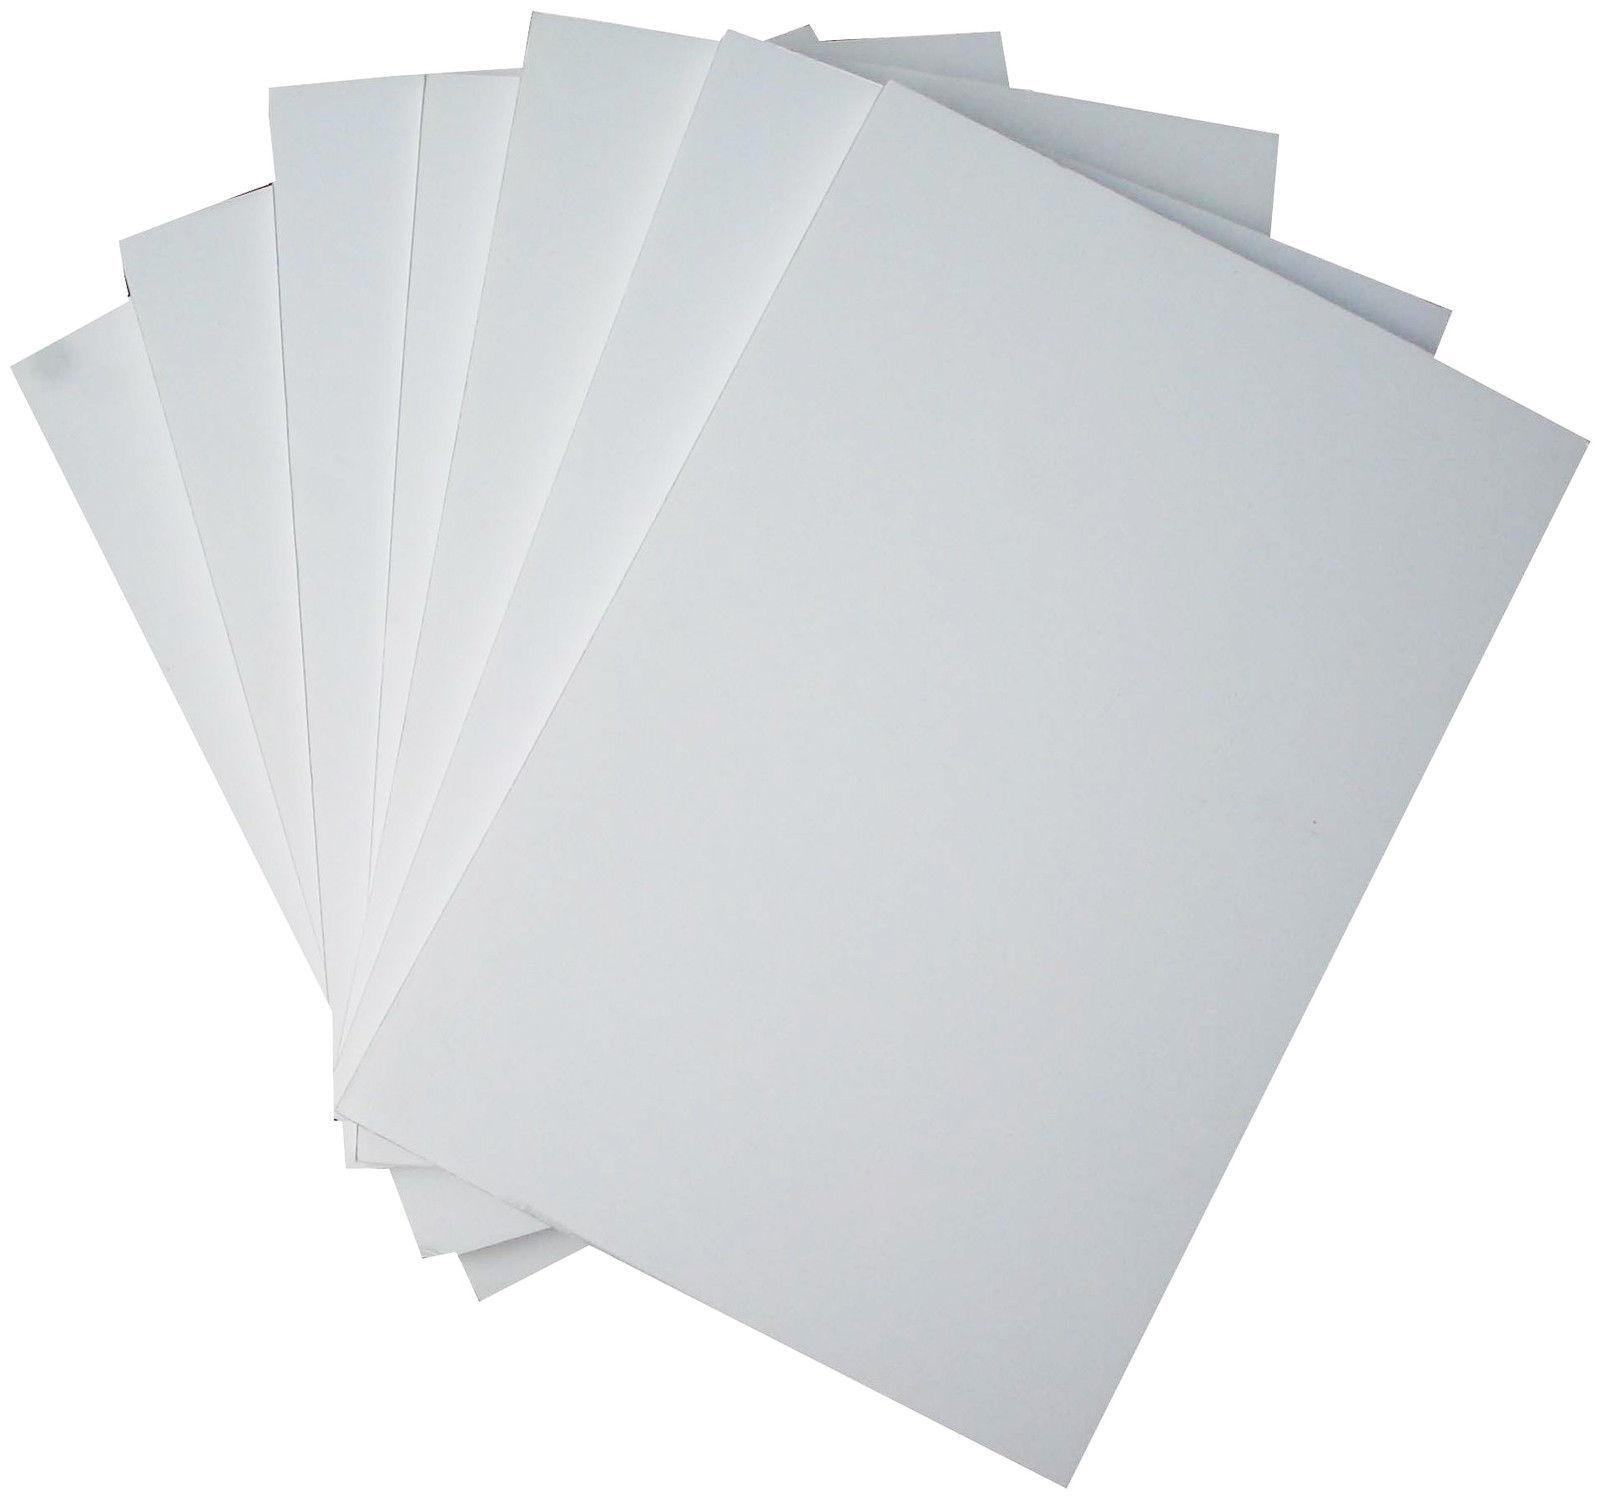 White foam board foamboard 5mm a3 size sheets ebay for How to cut thick craft foam